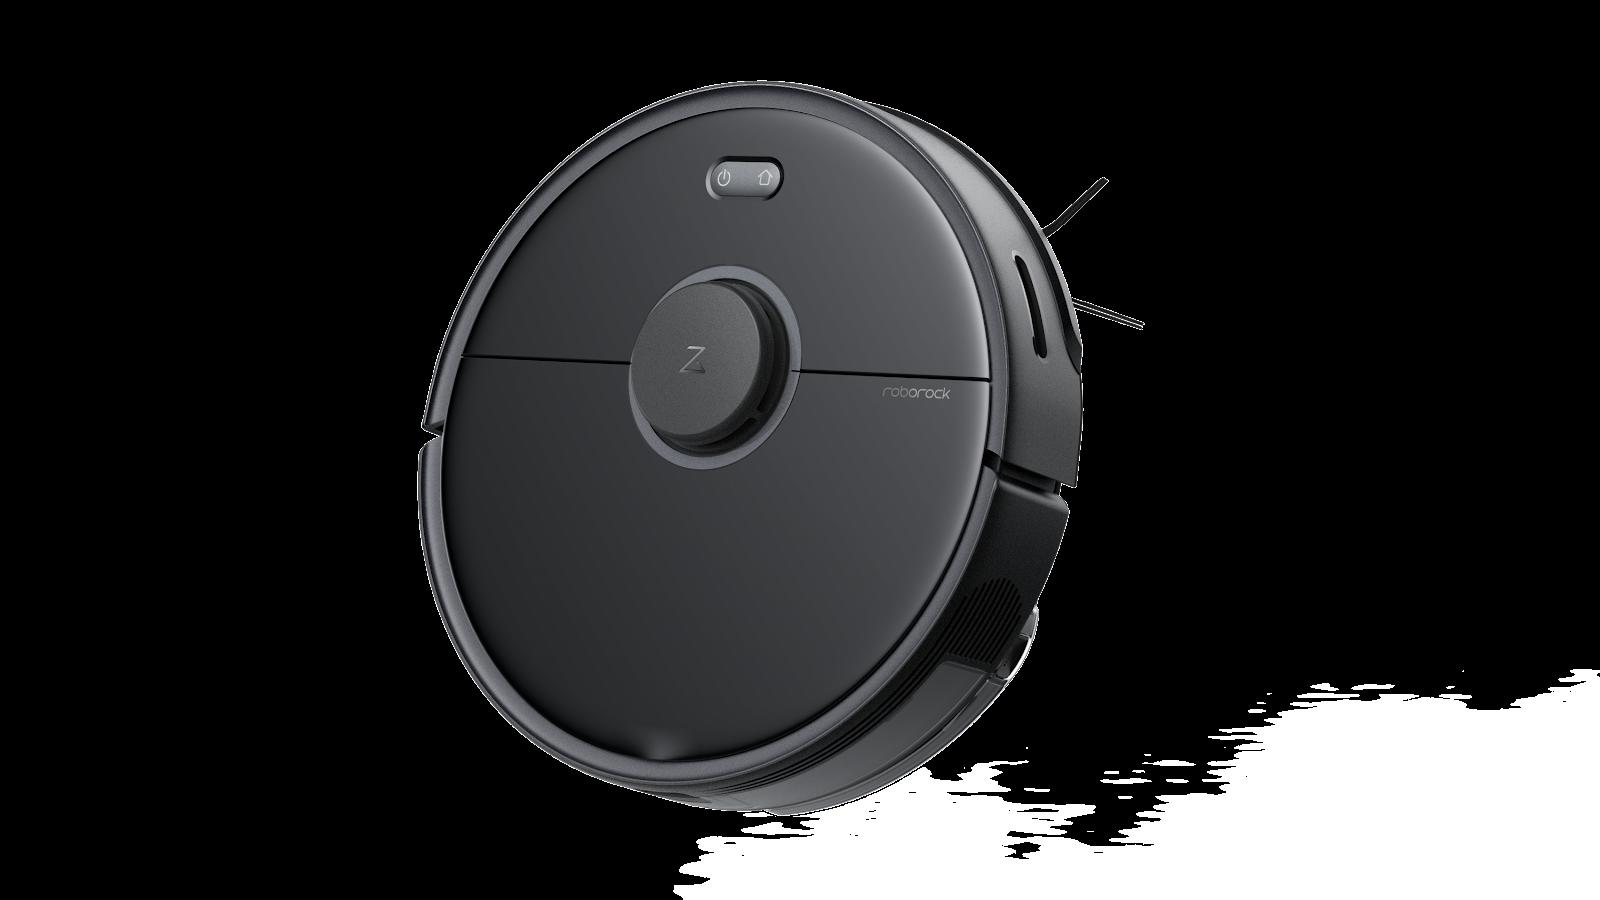 Roborock's versatile smart vacuum lineup is on sale during the Prime Days 4